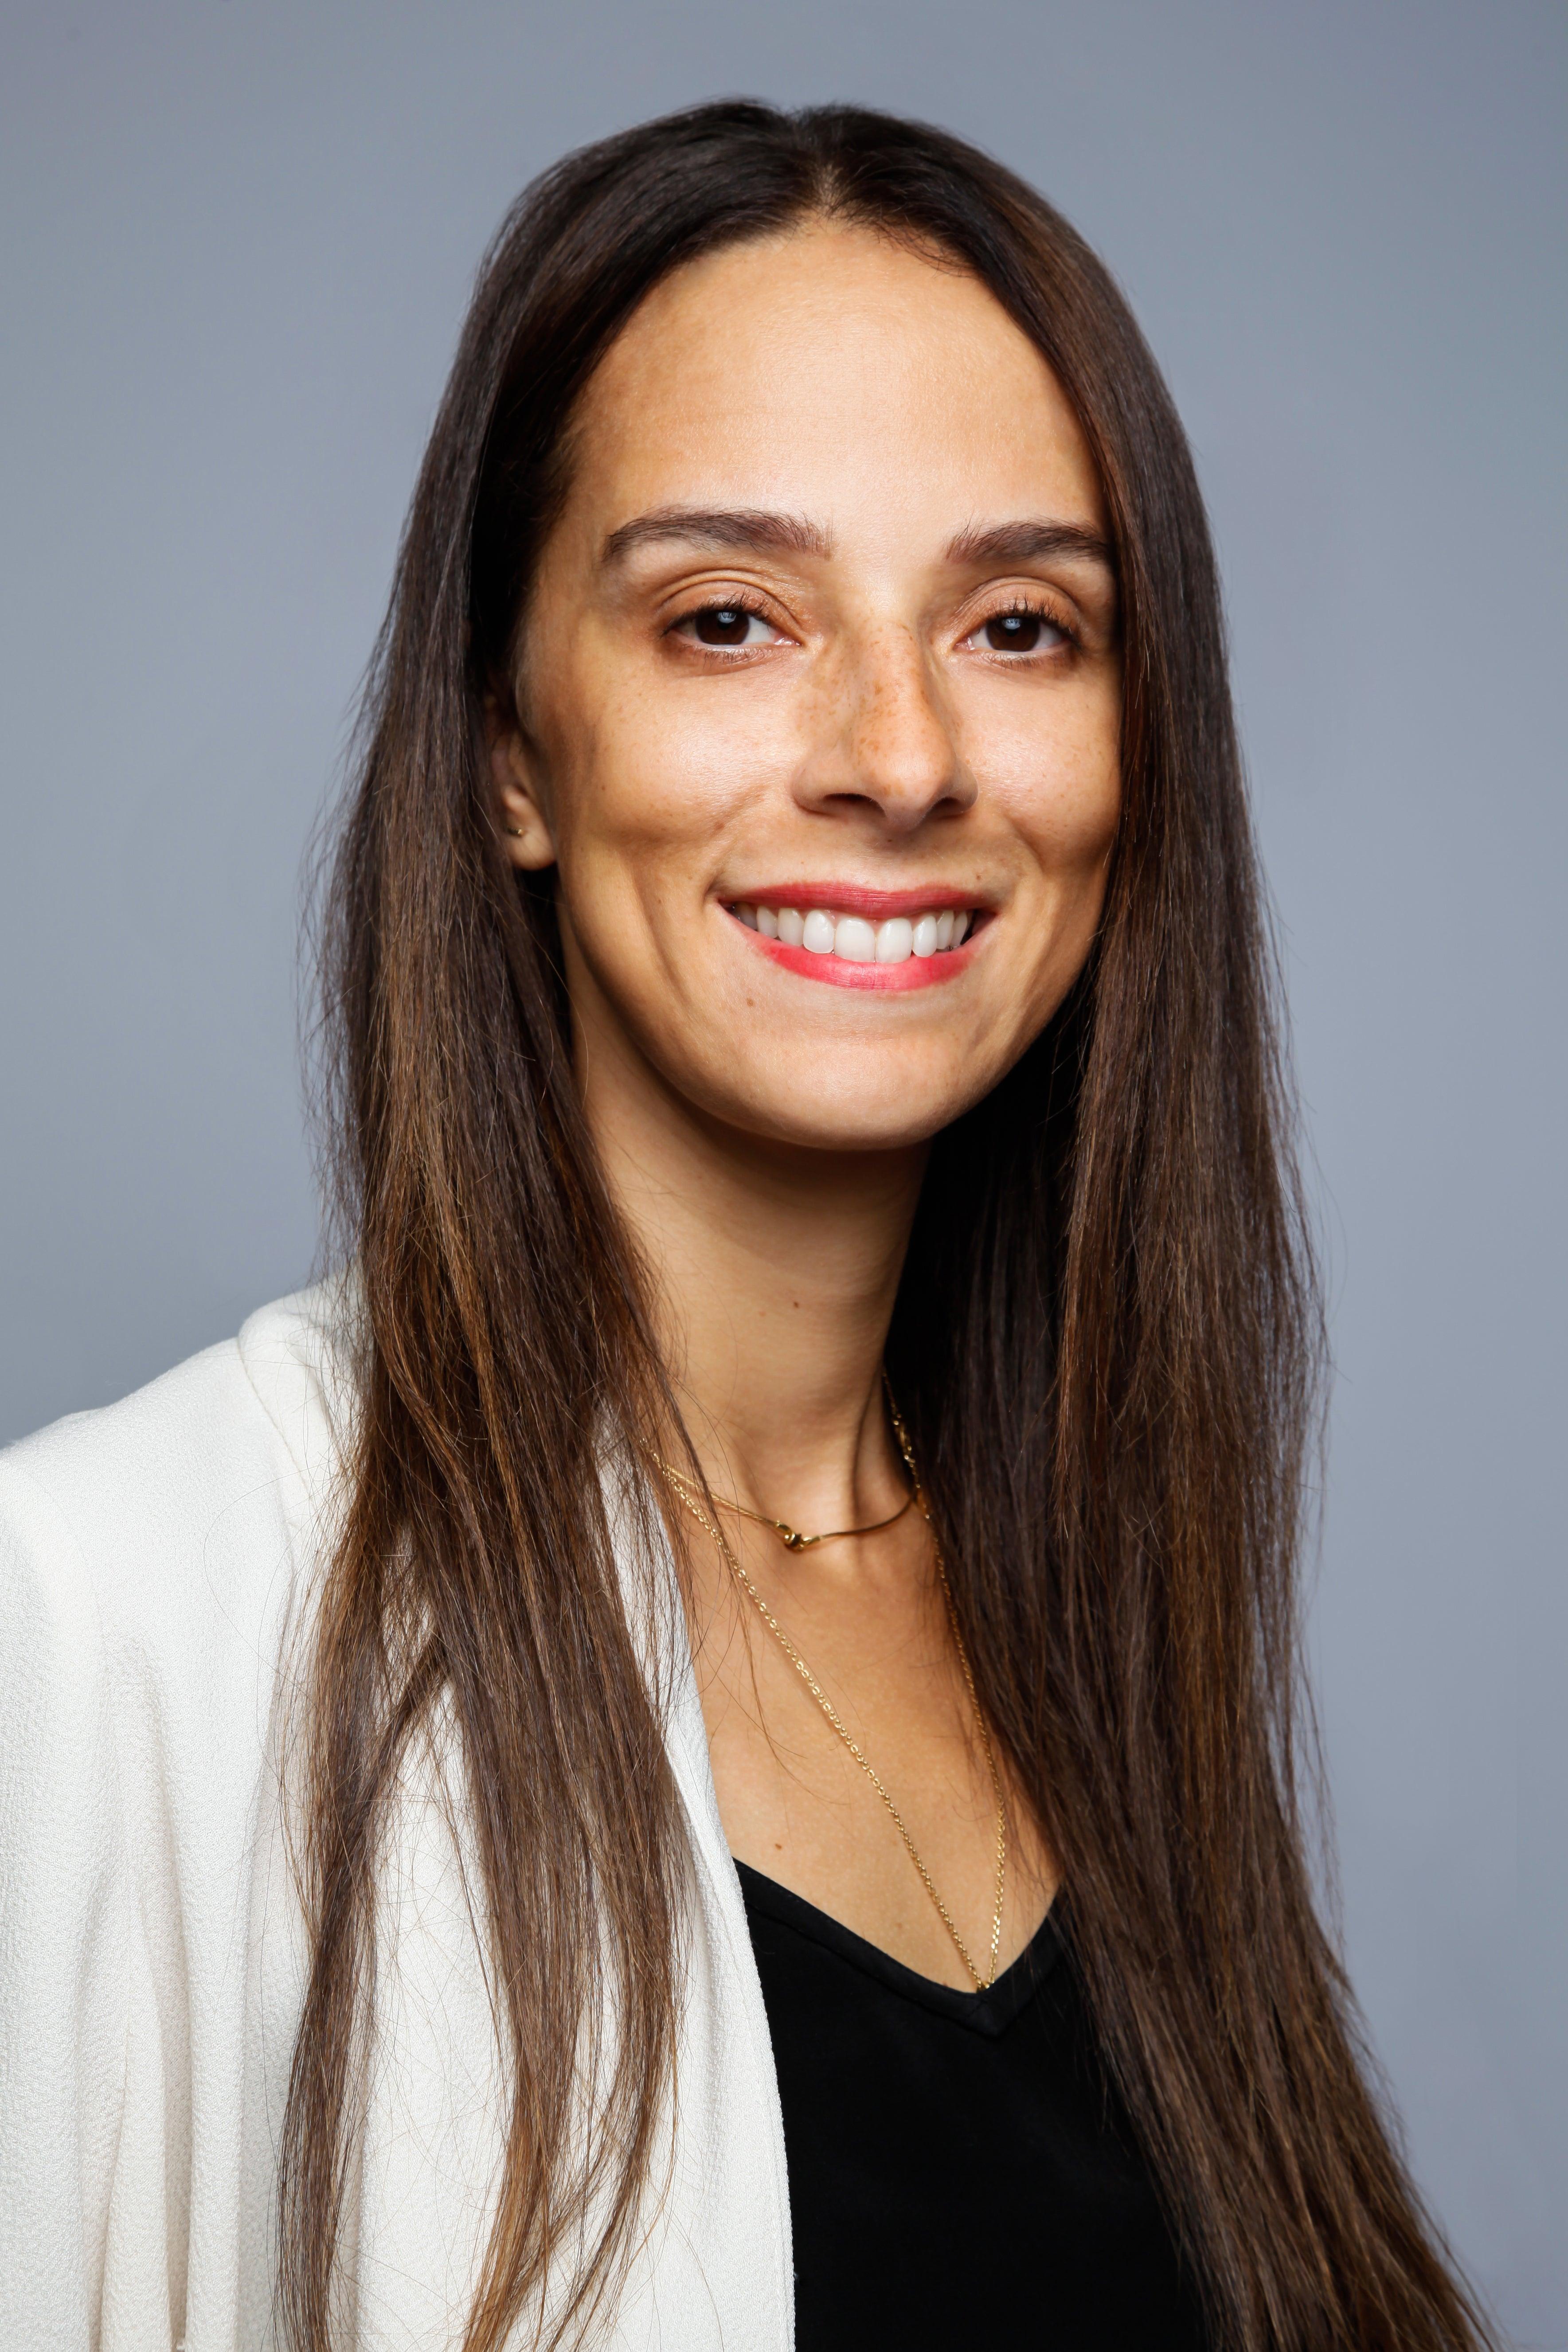 Five Minutes With Entrepreneur Leslie Mallart, Founder, Dubai Confidential